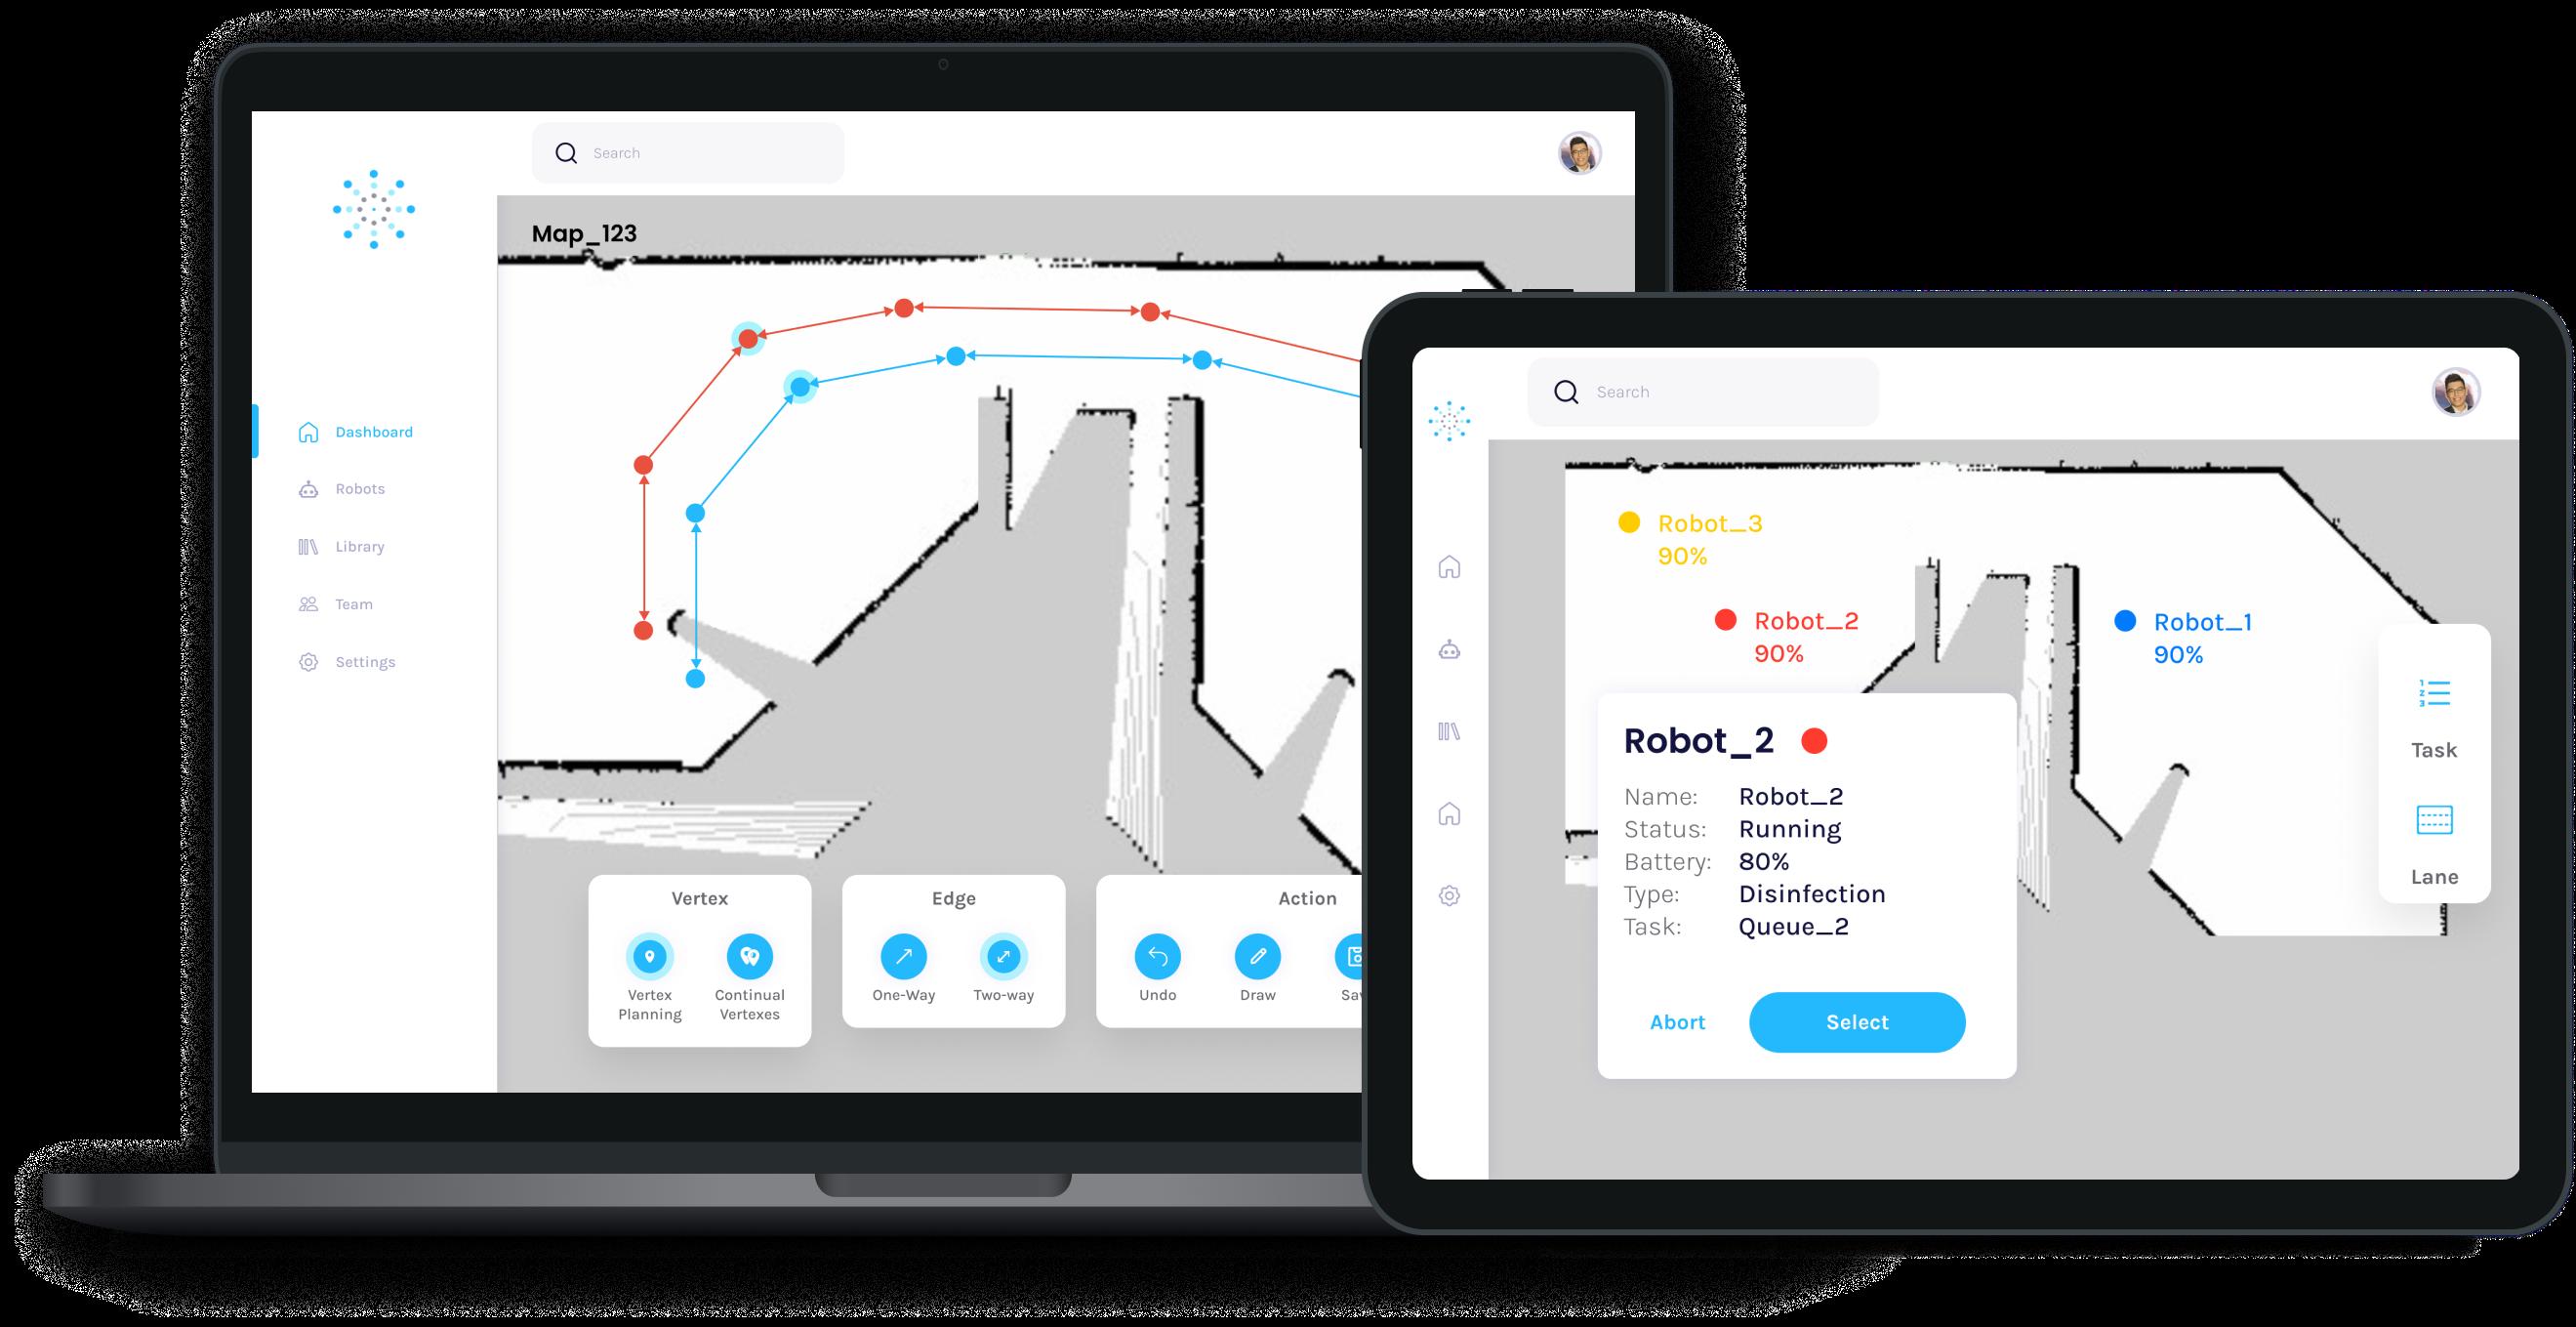 Seirios Reliable fleet management system